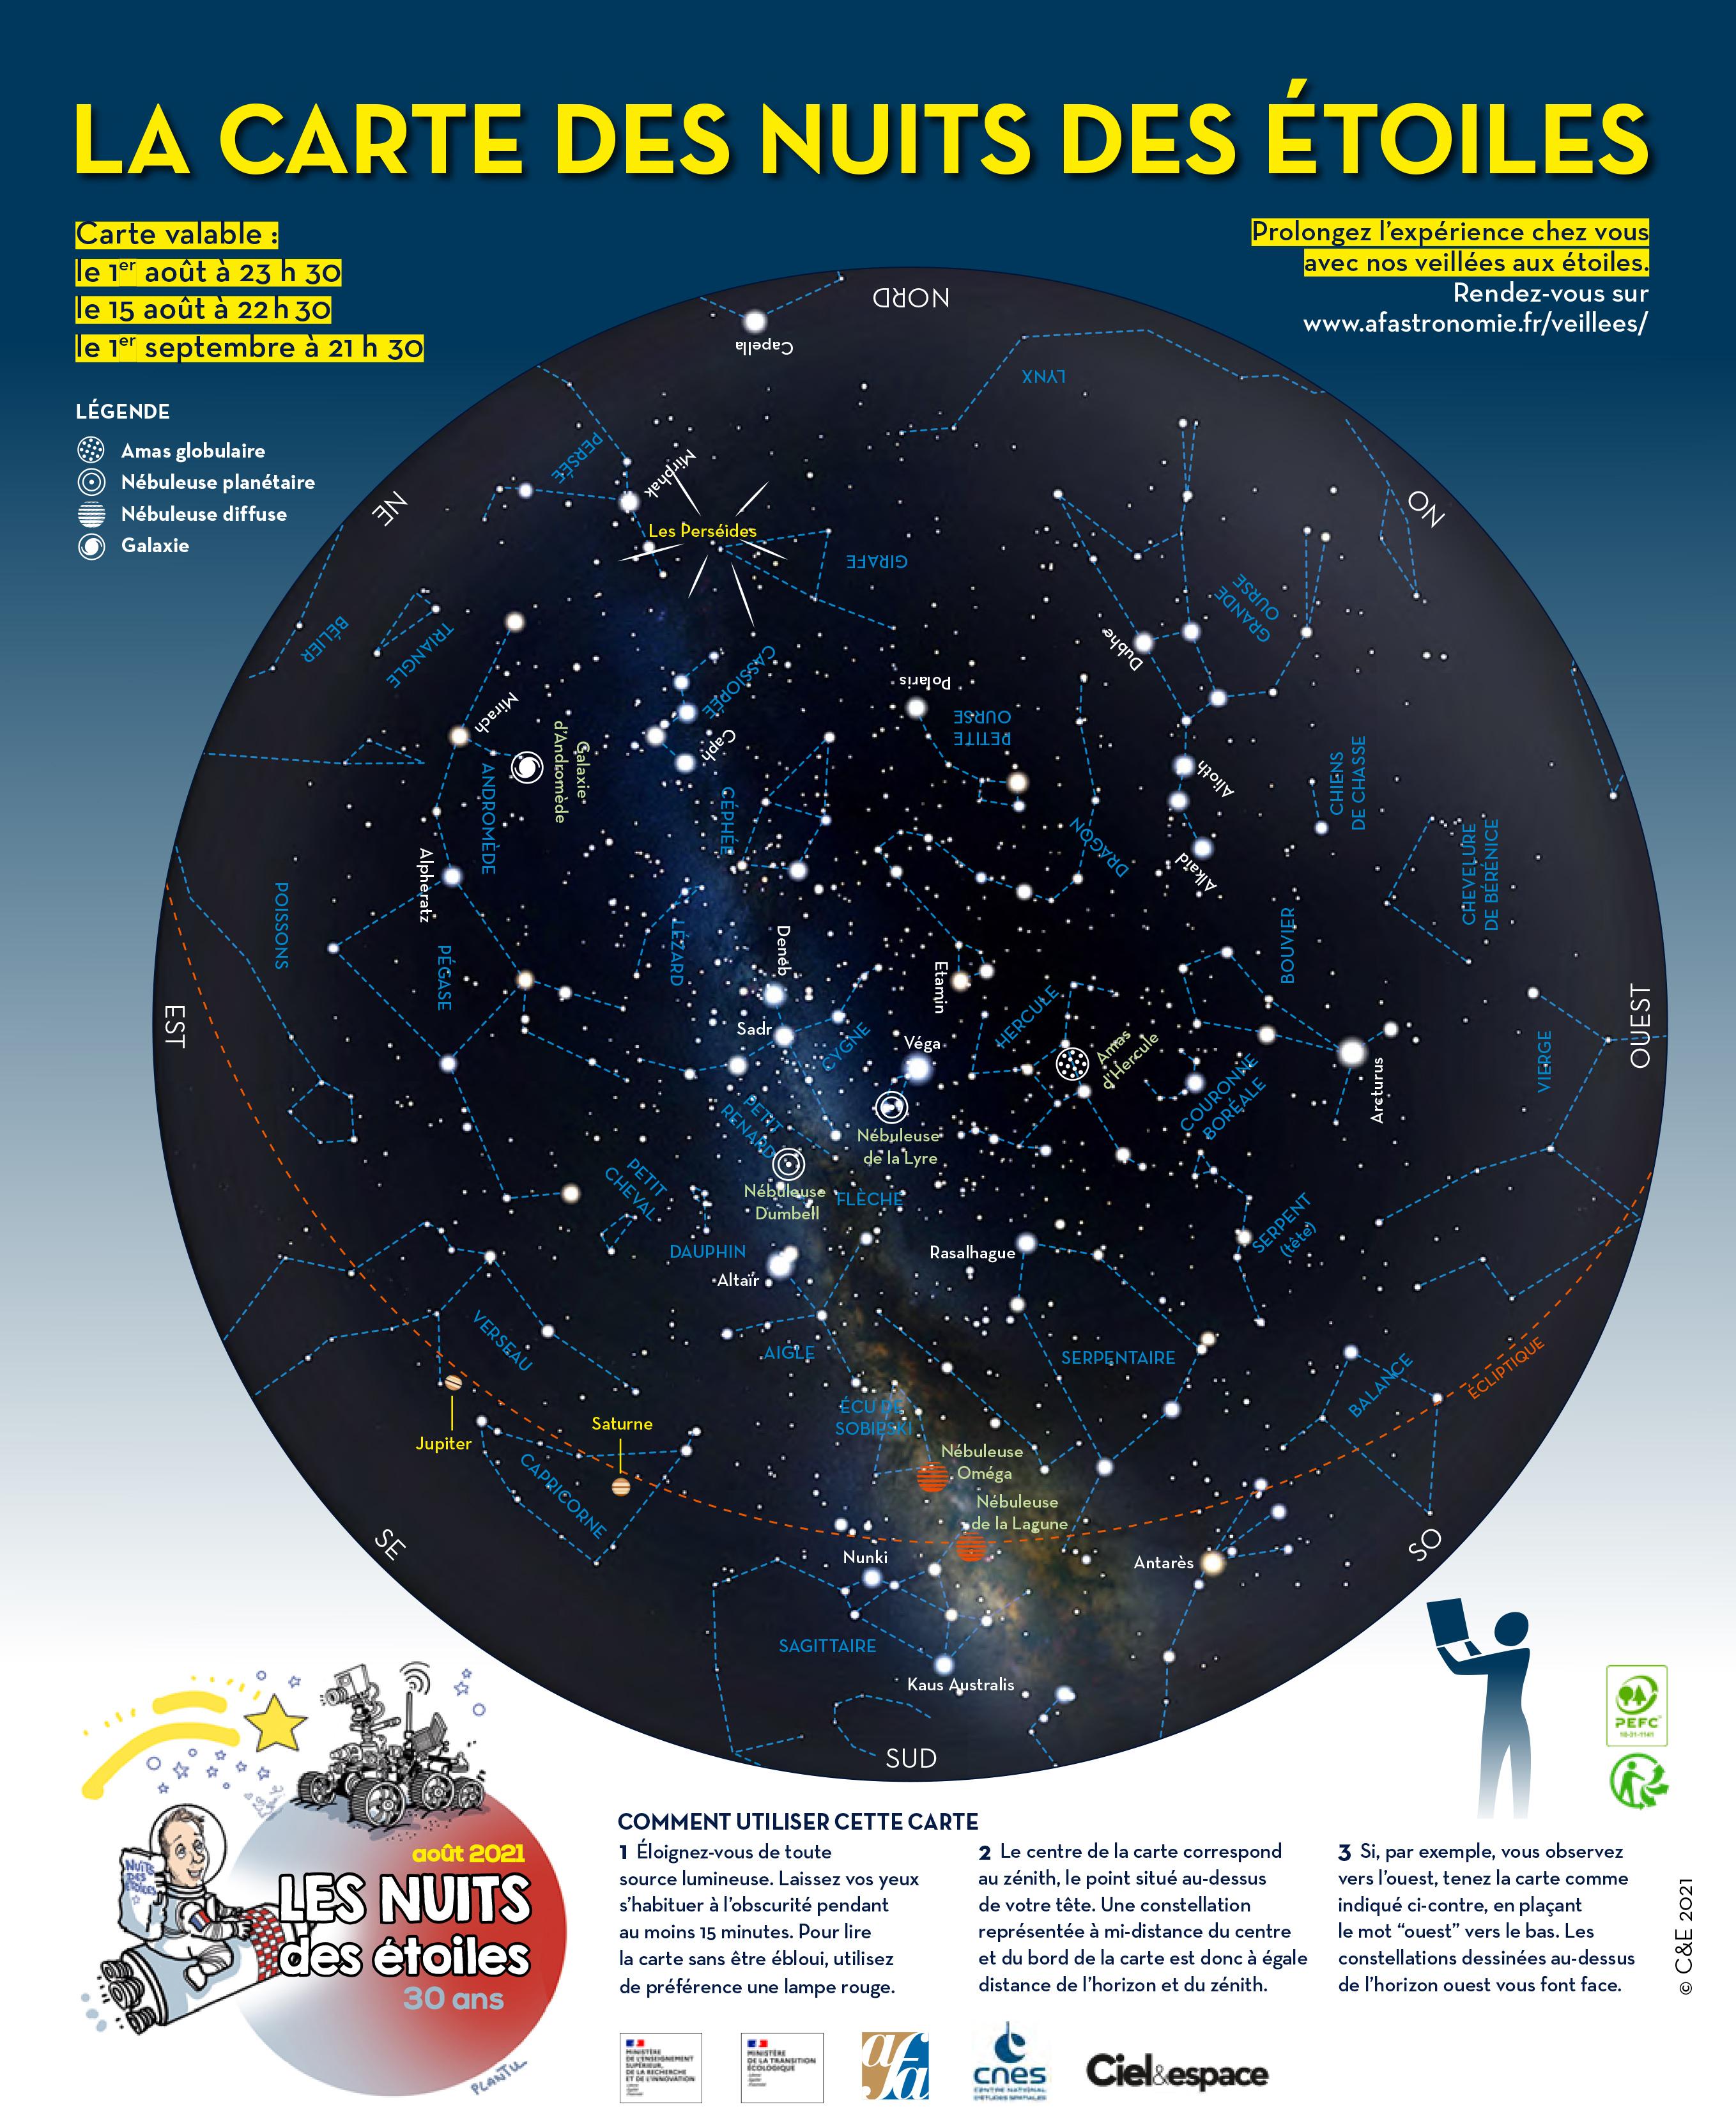 carte-nuits-etoiles_2021